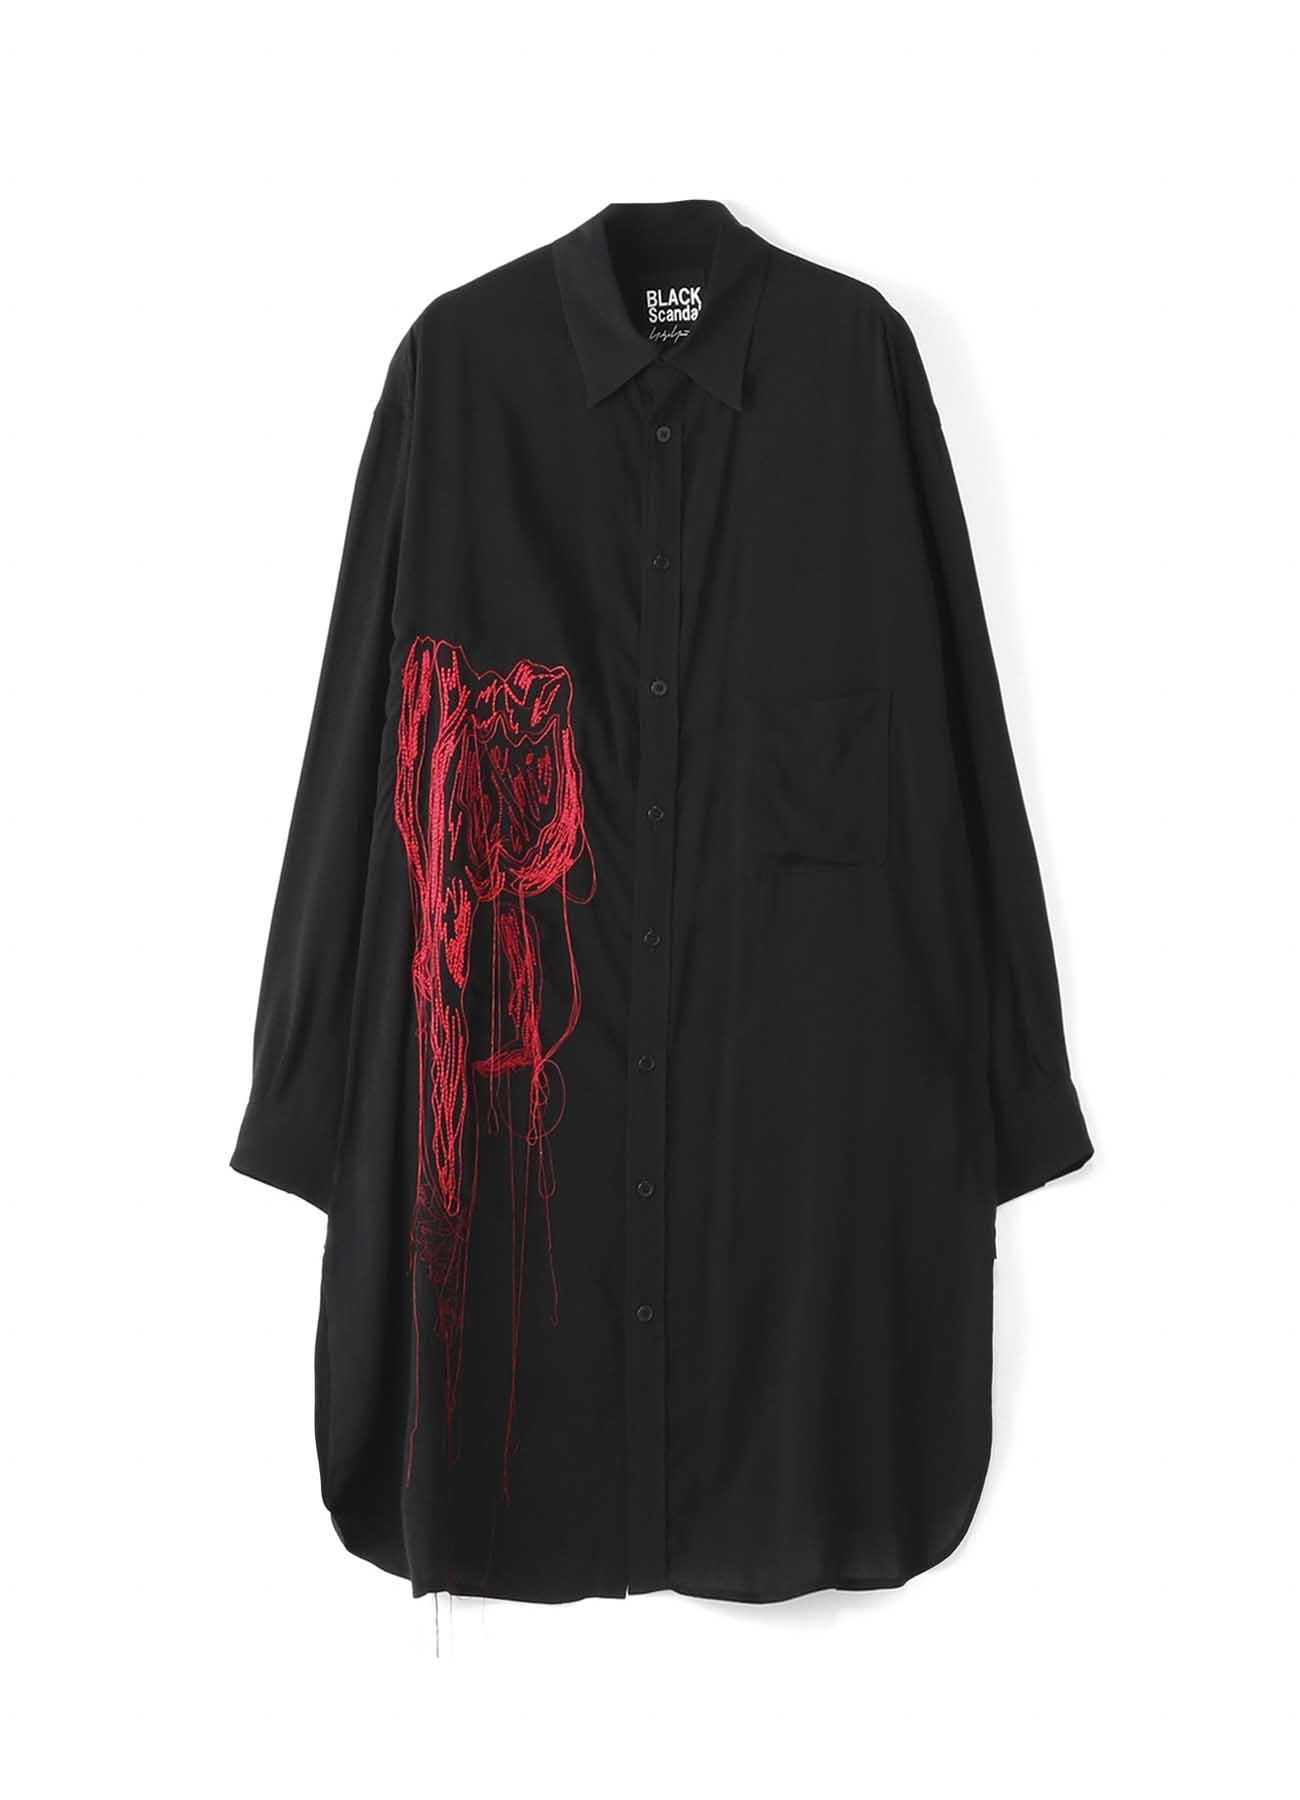 BLACK Scandal? 裾ラウンド「シルエット」刺繍オーバーシャツ